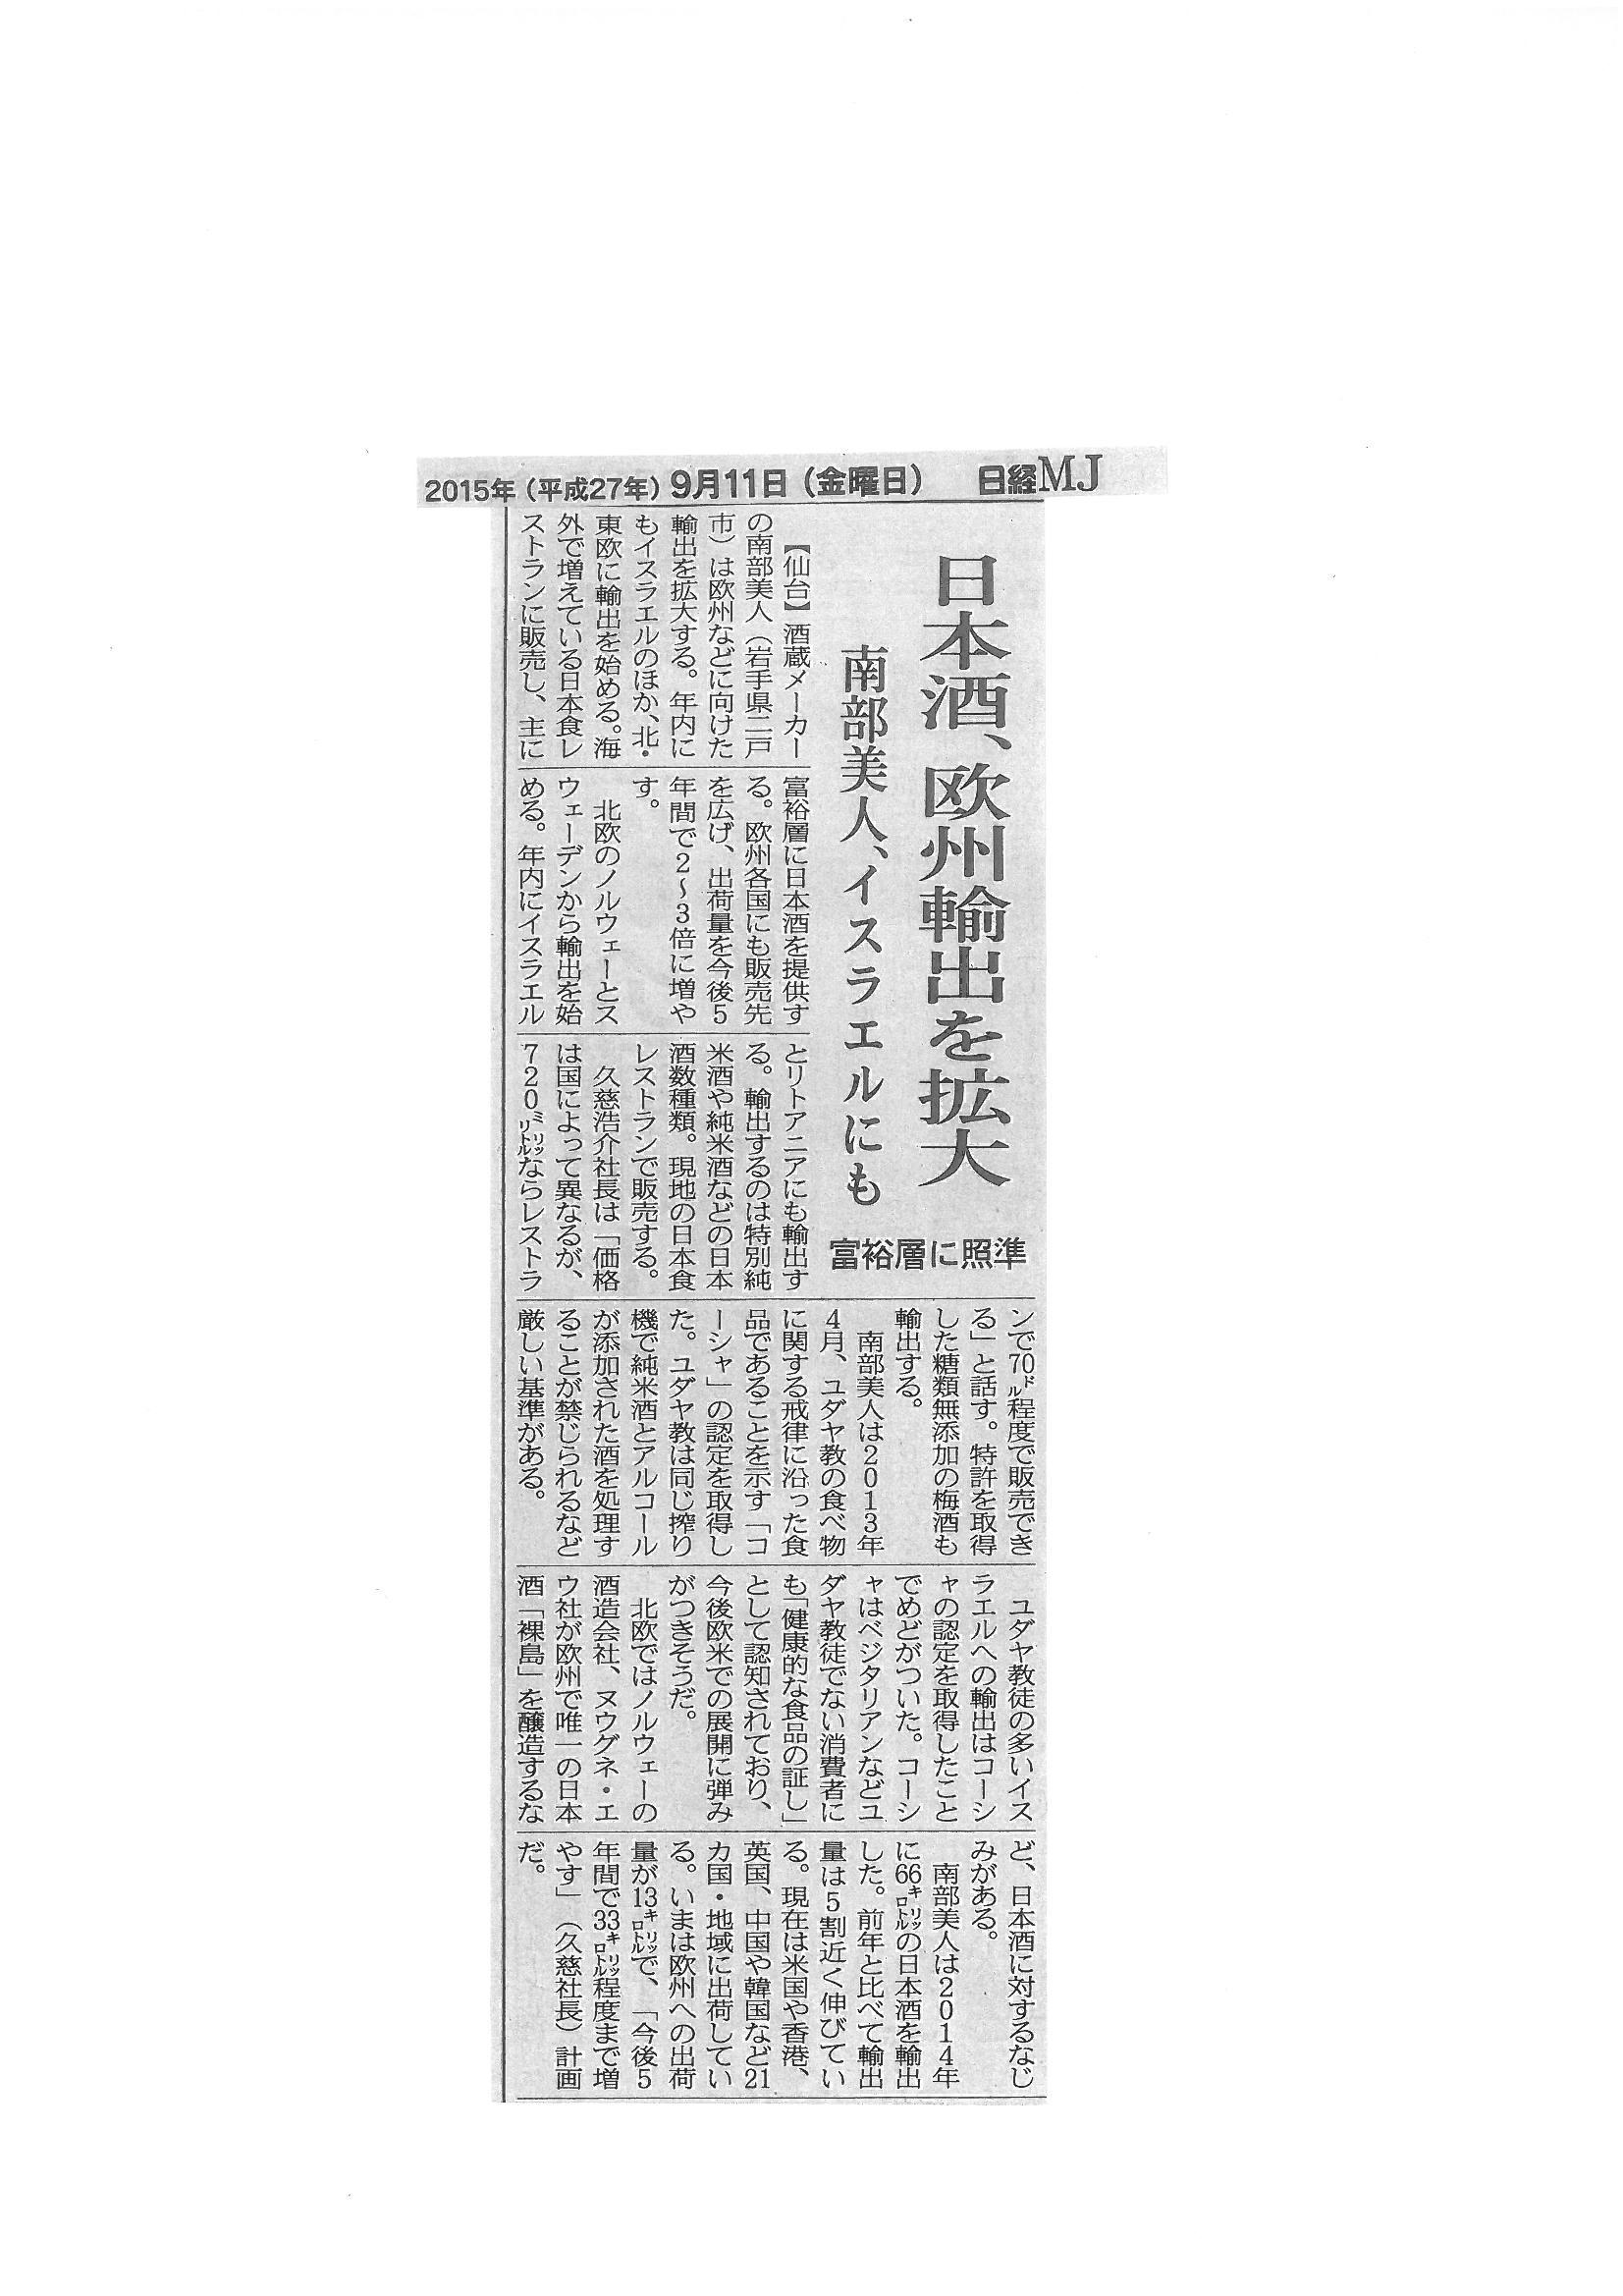 日本MJ2015年9月11日